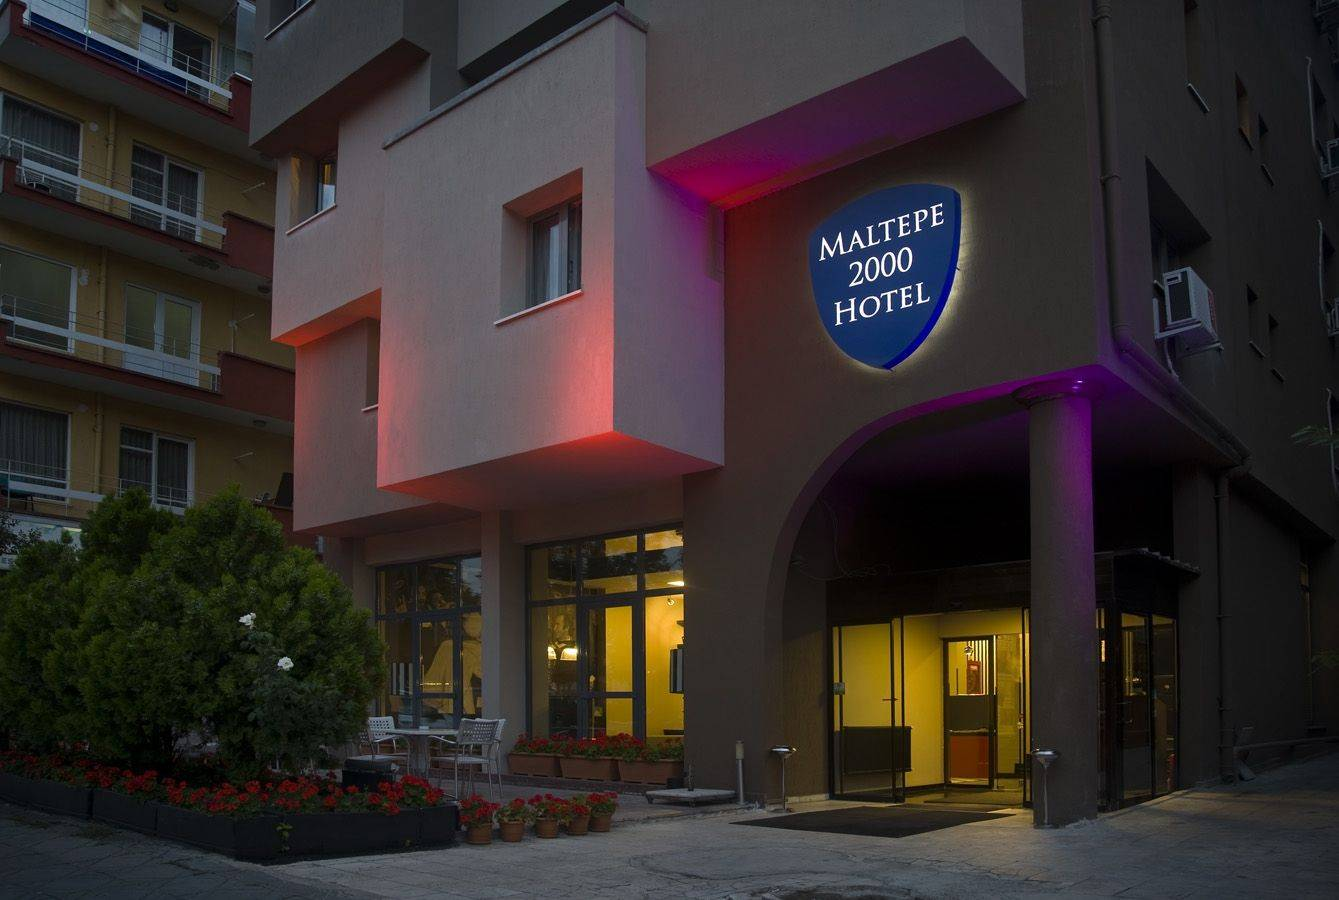 Maltepe 2000 Otel, Ankara, Maltepe, 27358